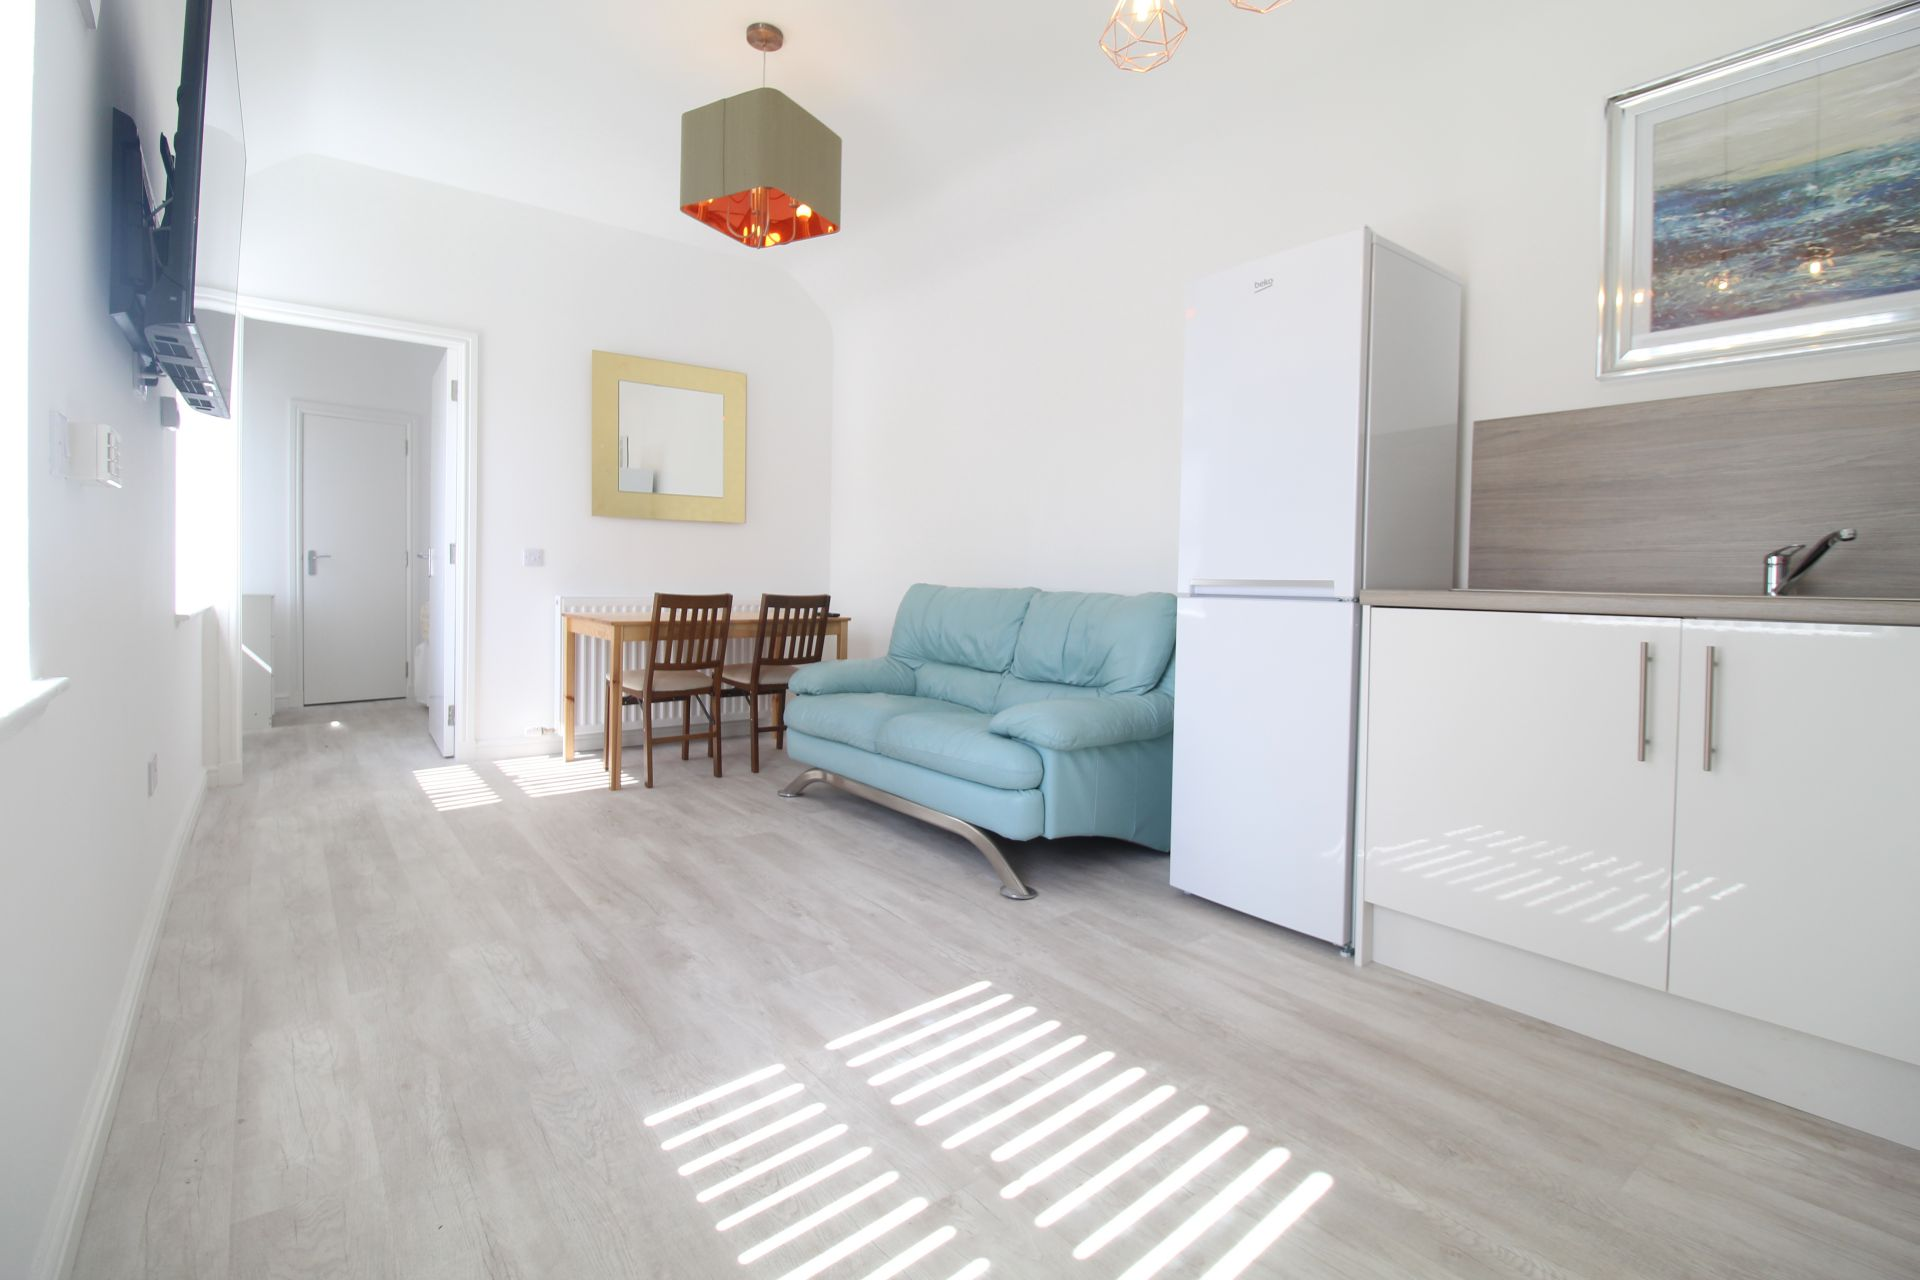 ARD-Properties-Development-Sites-Buy-Homes-Rent-Aberdeenshire-Rentals-Apartment-C-Loanhead-Terrace-Aberdeen-Banner (3)